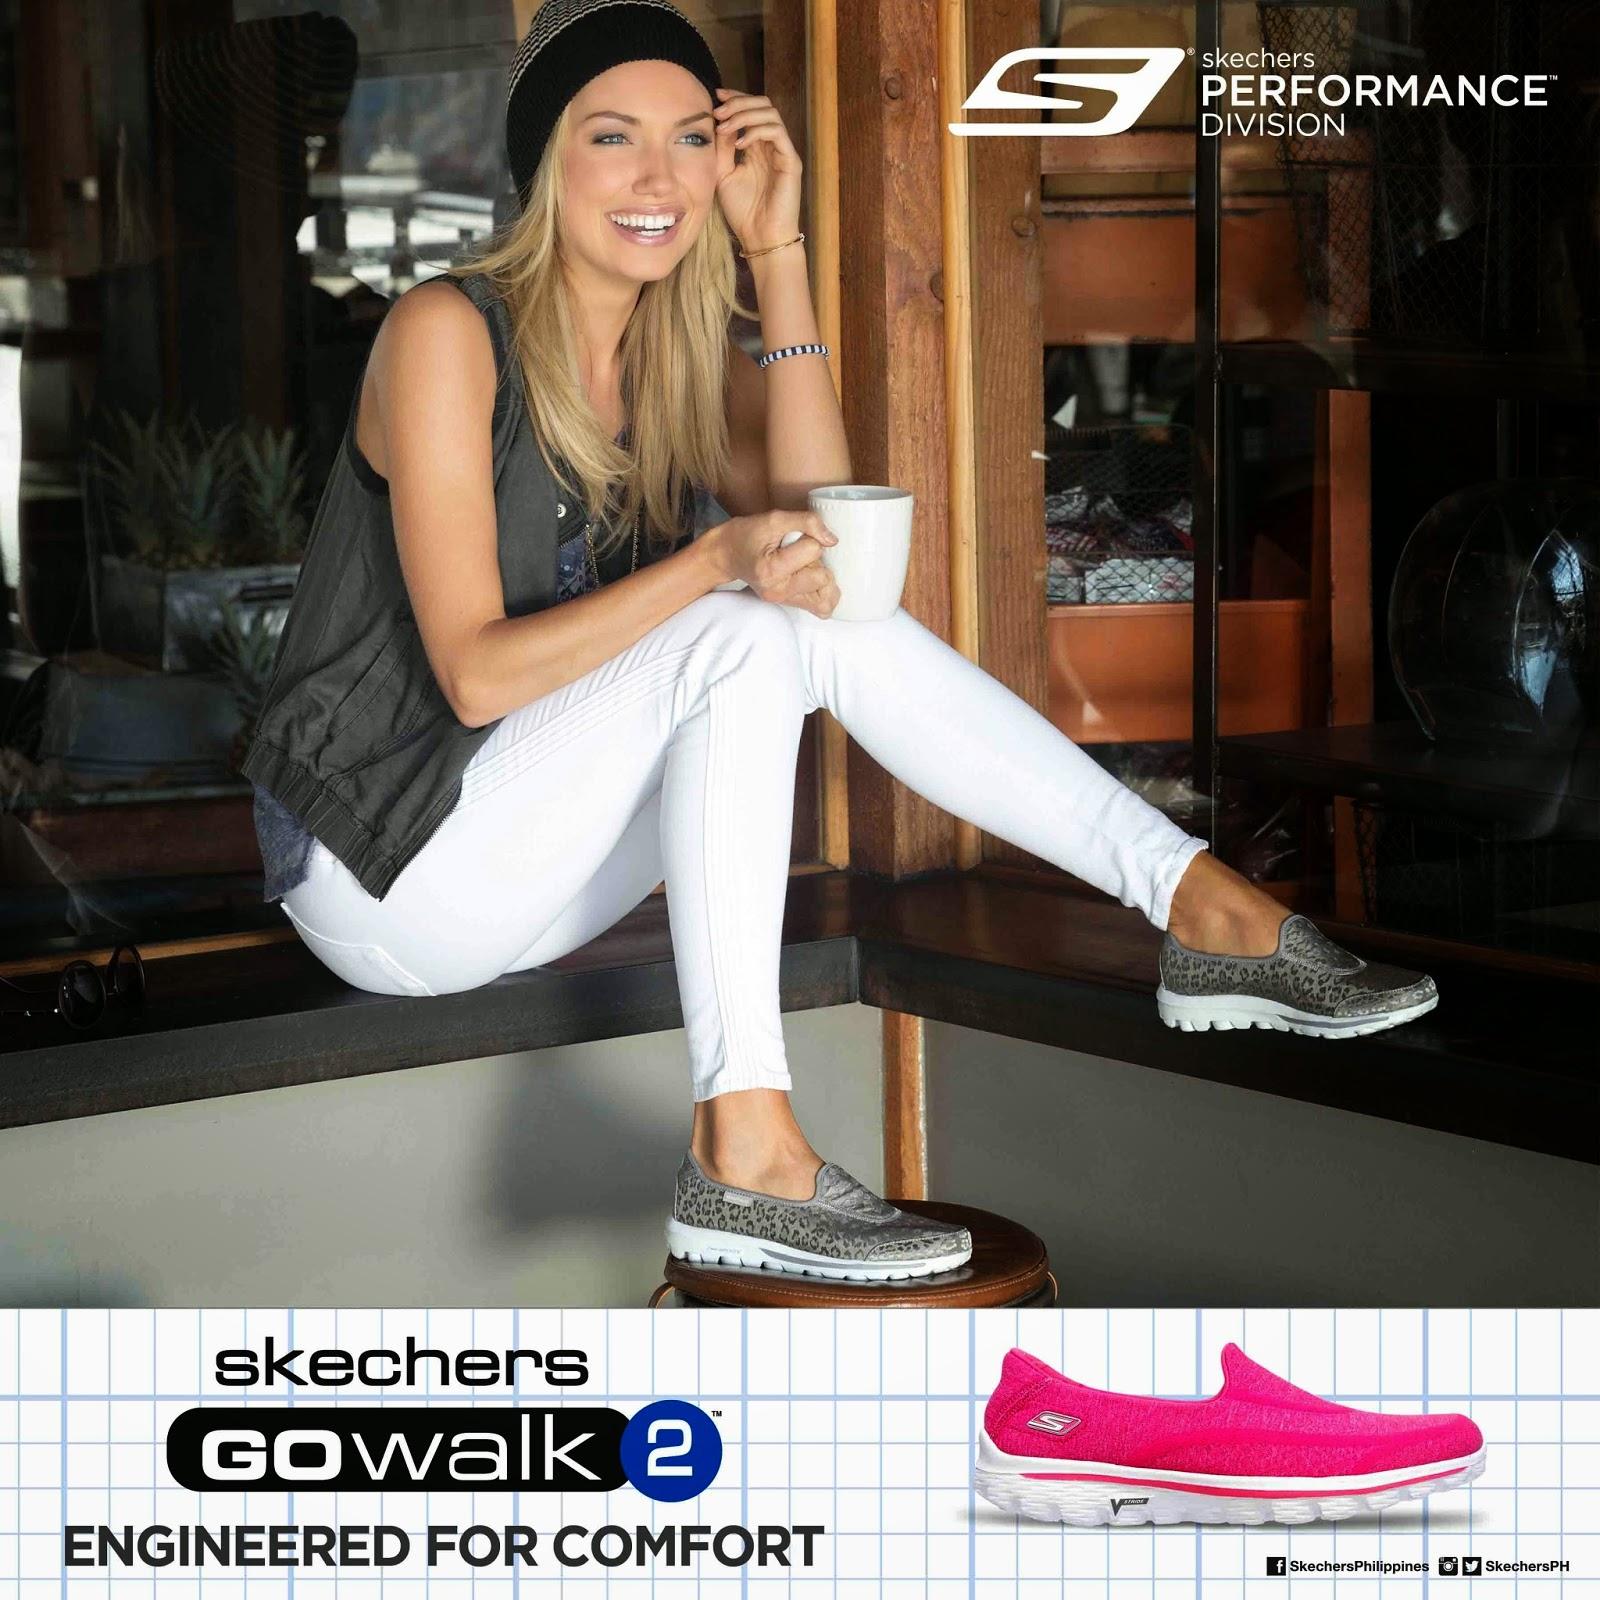 skechers go walk 2 v stride Sale,up to 58% DiscountsDiscounts